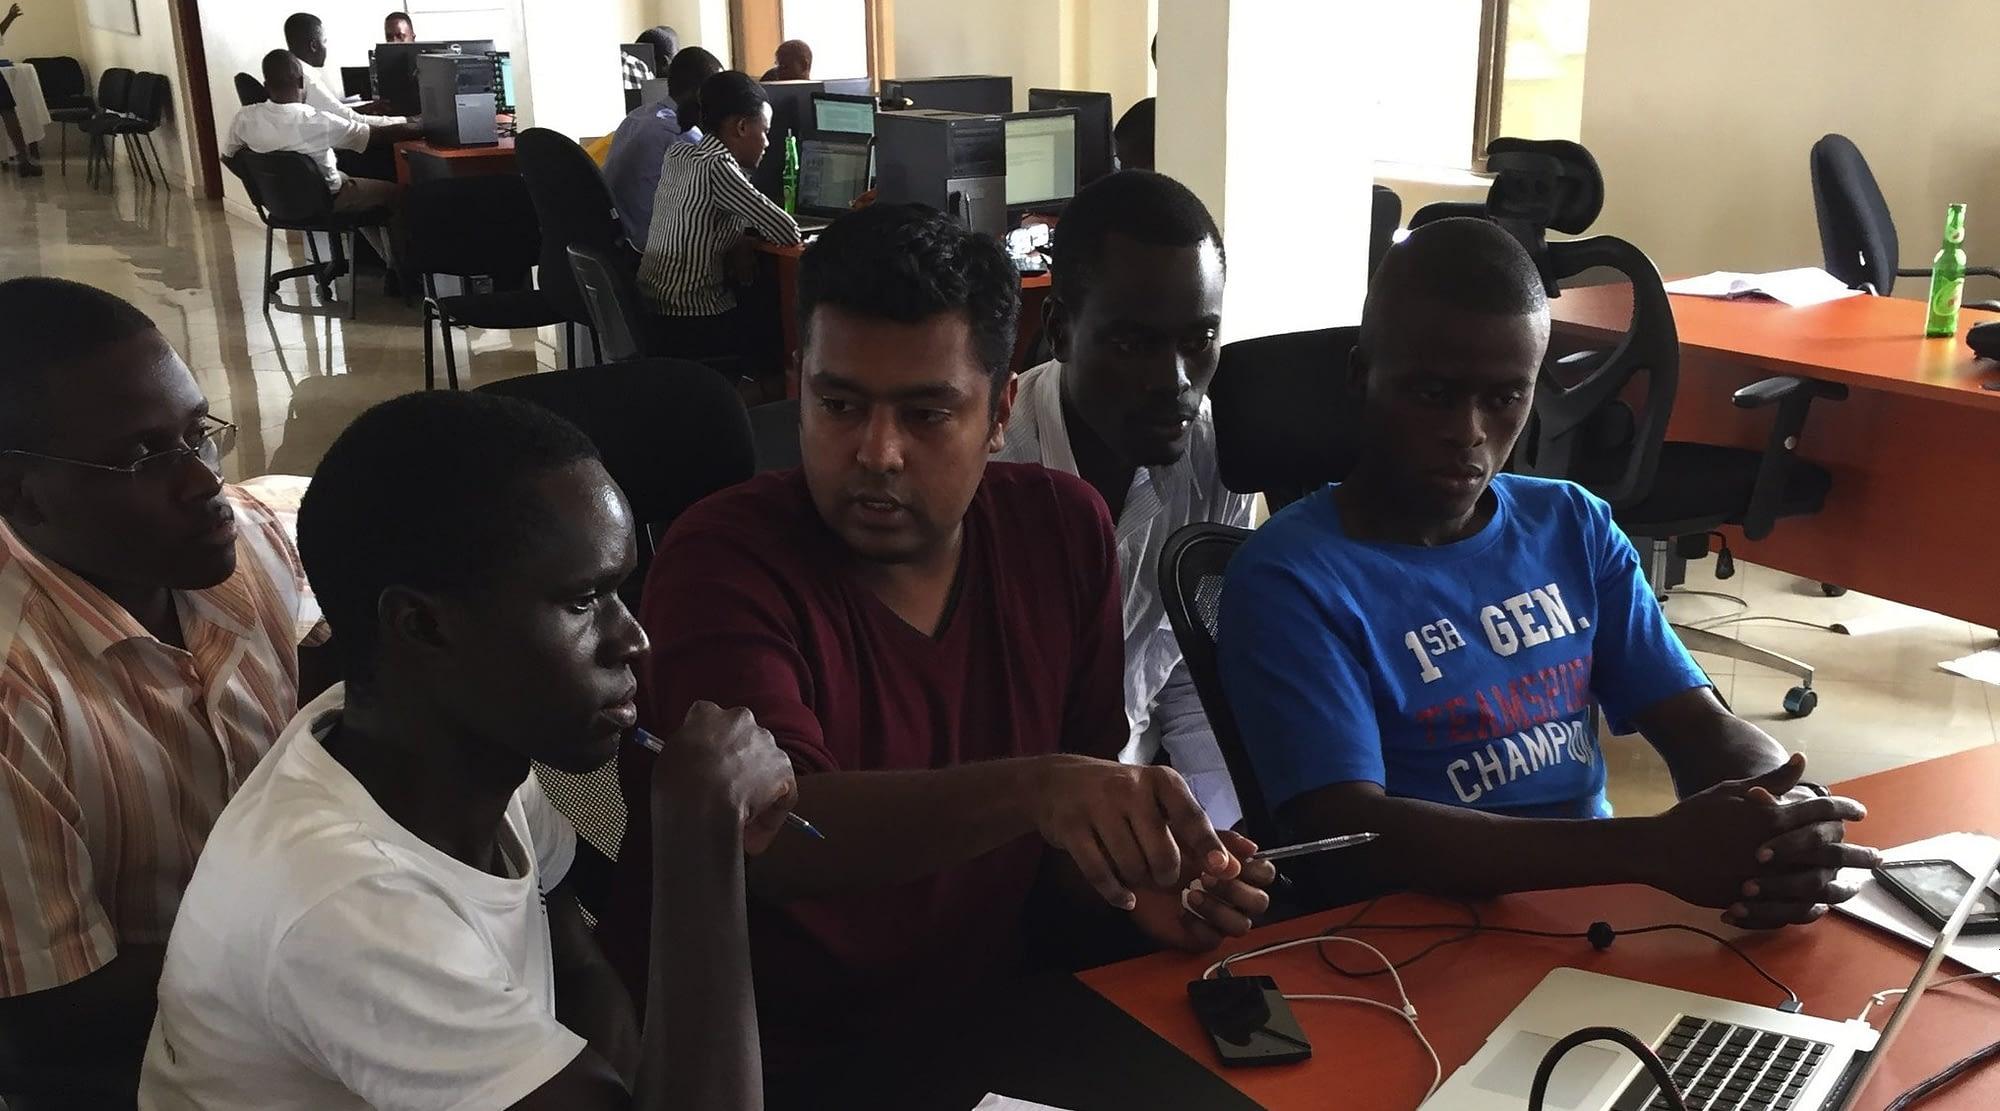 Microsoft developer Anand Mariappan, center, works with local tech-startup employees in Kampala, Uganda as part of Microsoft's International Skills-based Volunteering Program - MySkills4Afrika (Mariappan)